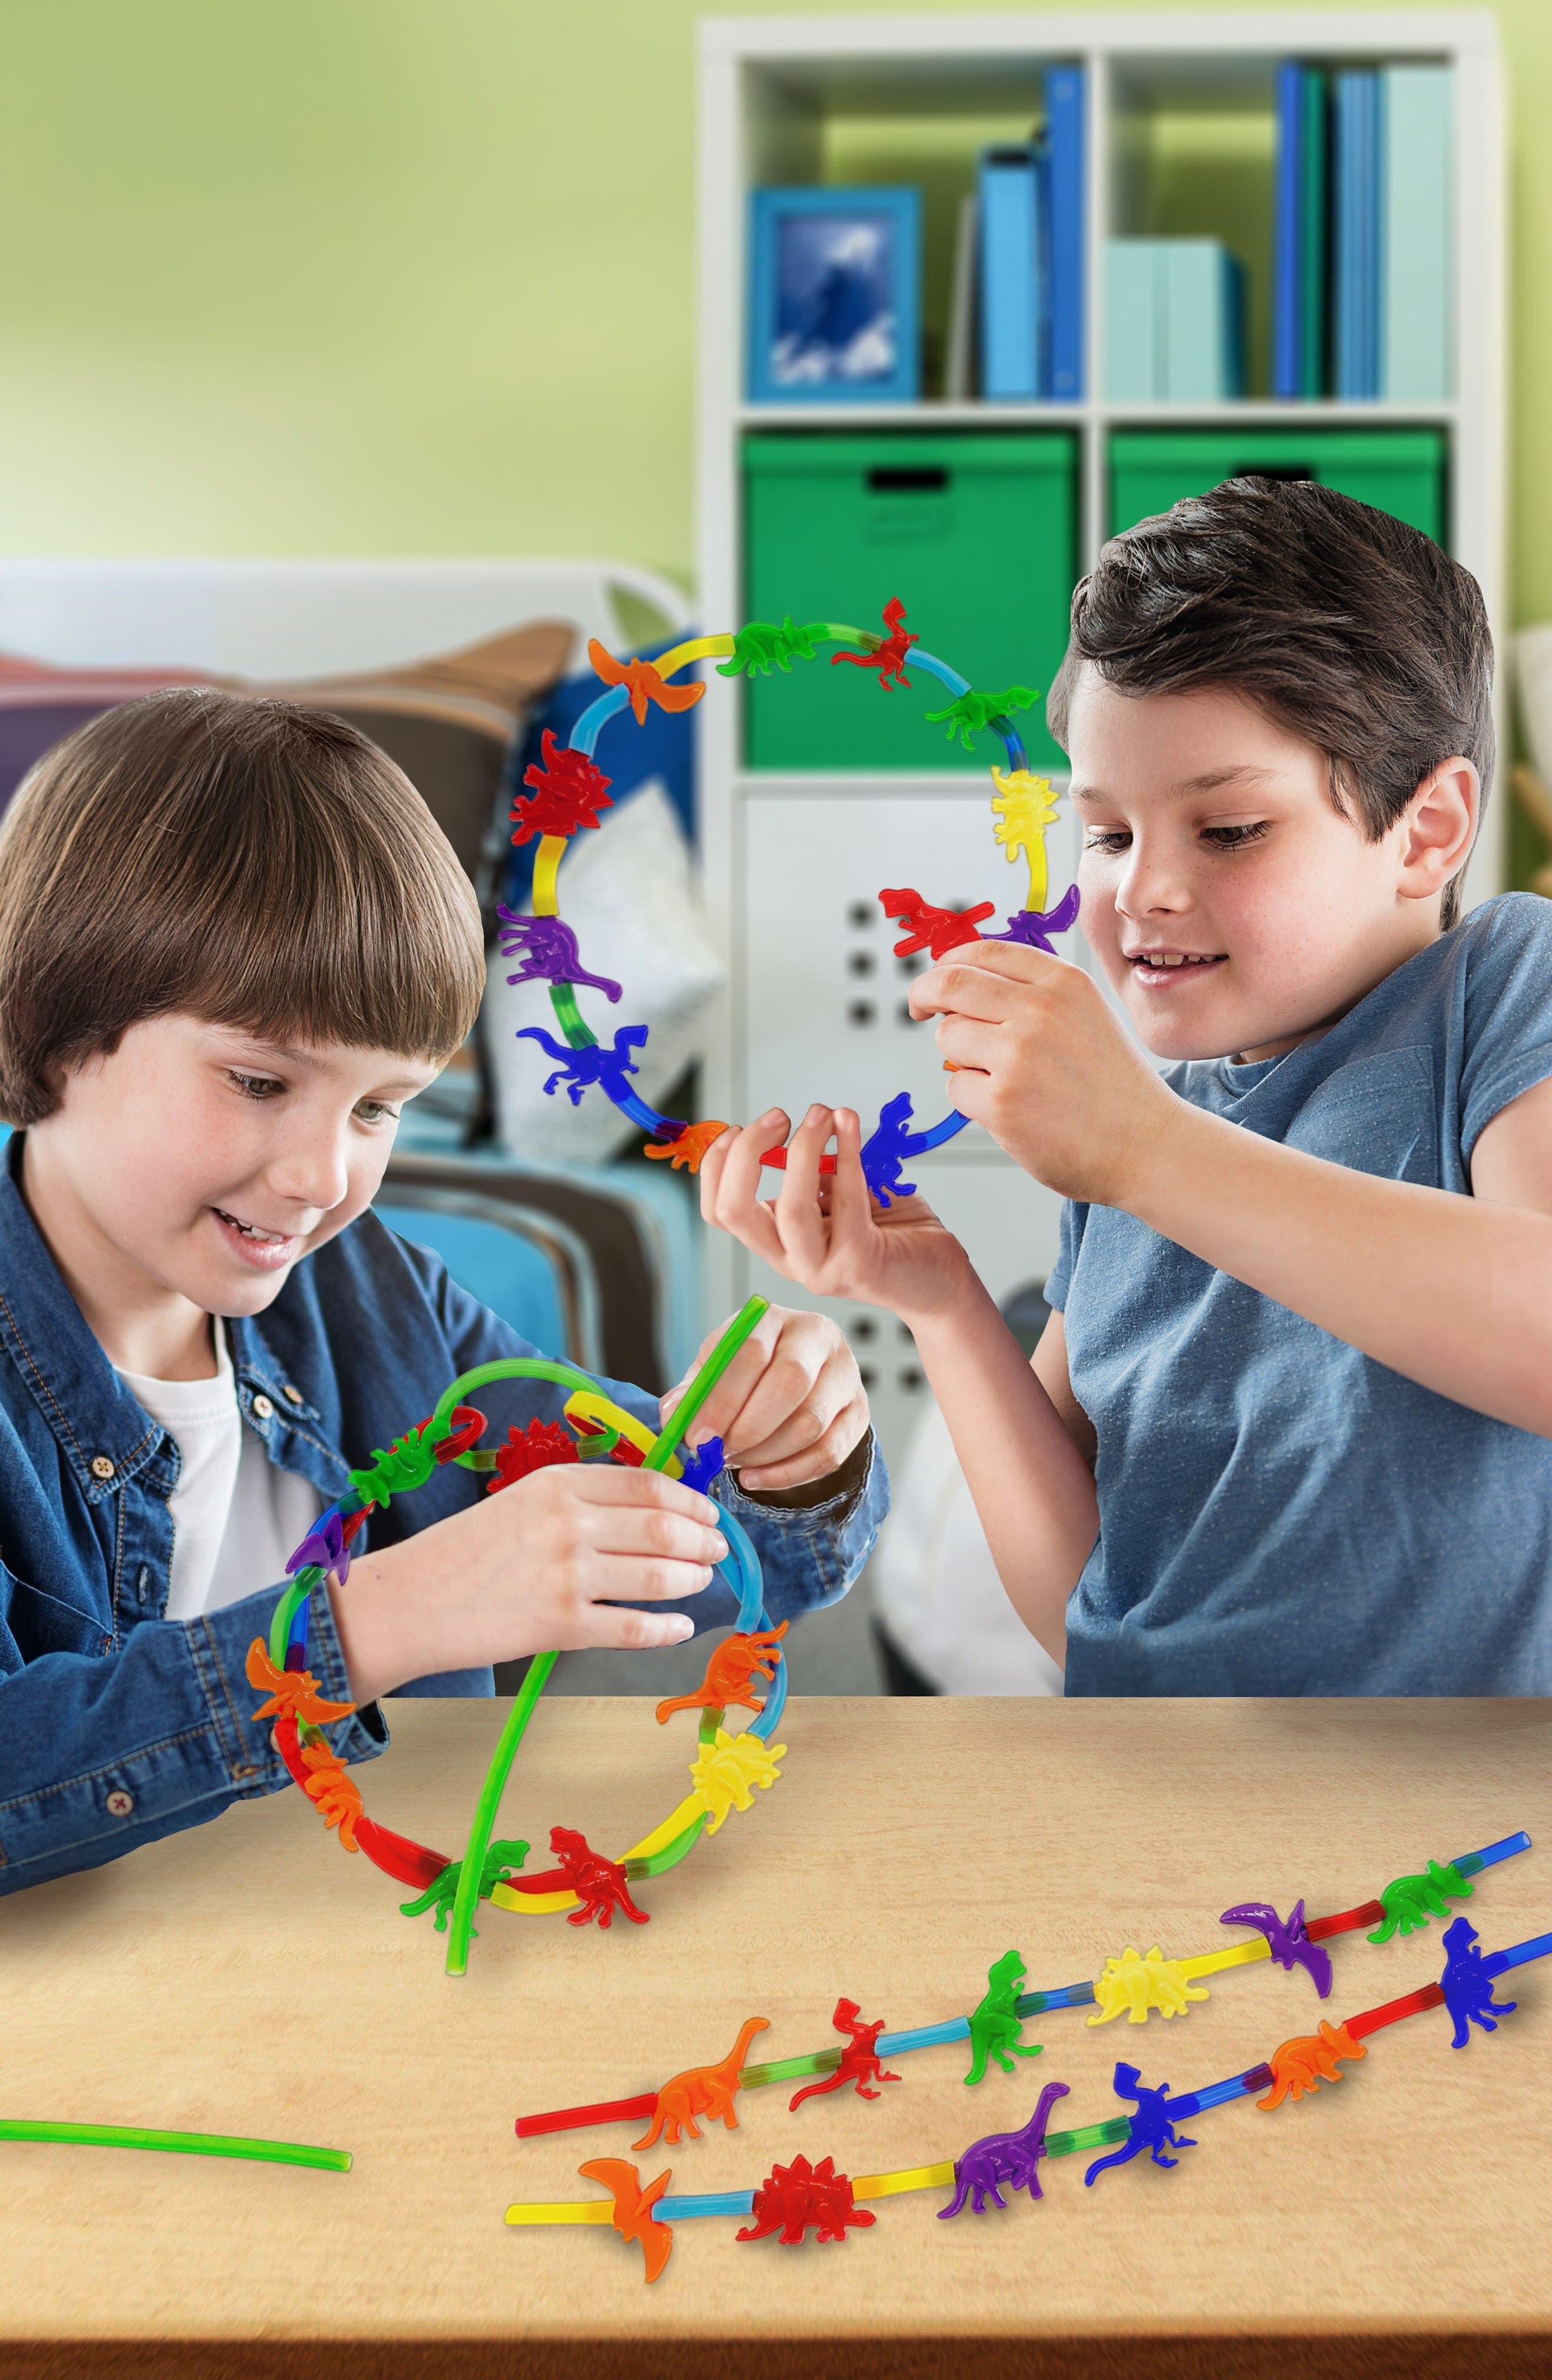 35-Piece Dinosaur Series Linking Toy Kit,                             Alternate thumbnail 3, color,                             Dinosaur